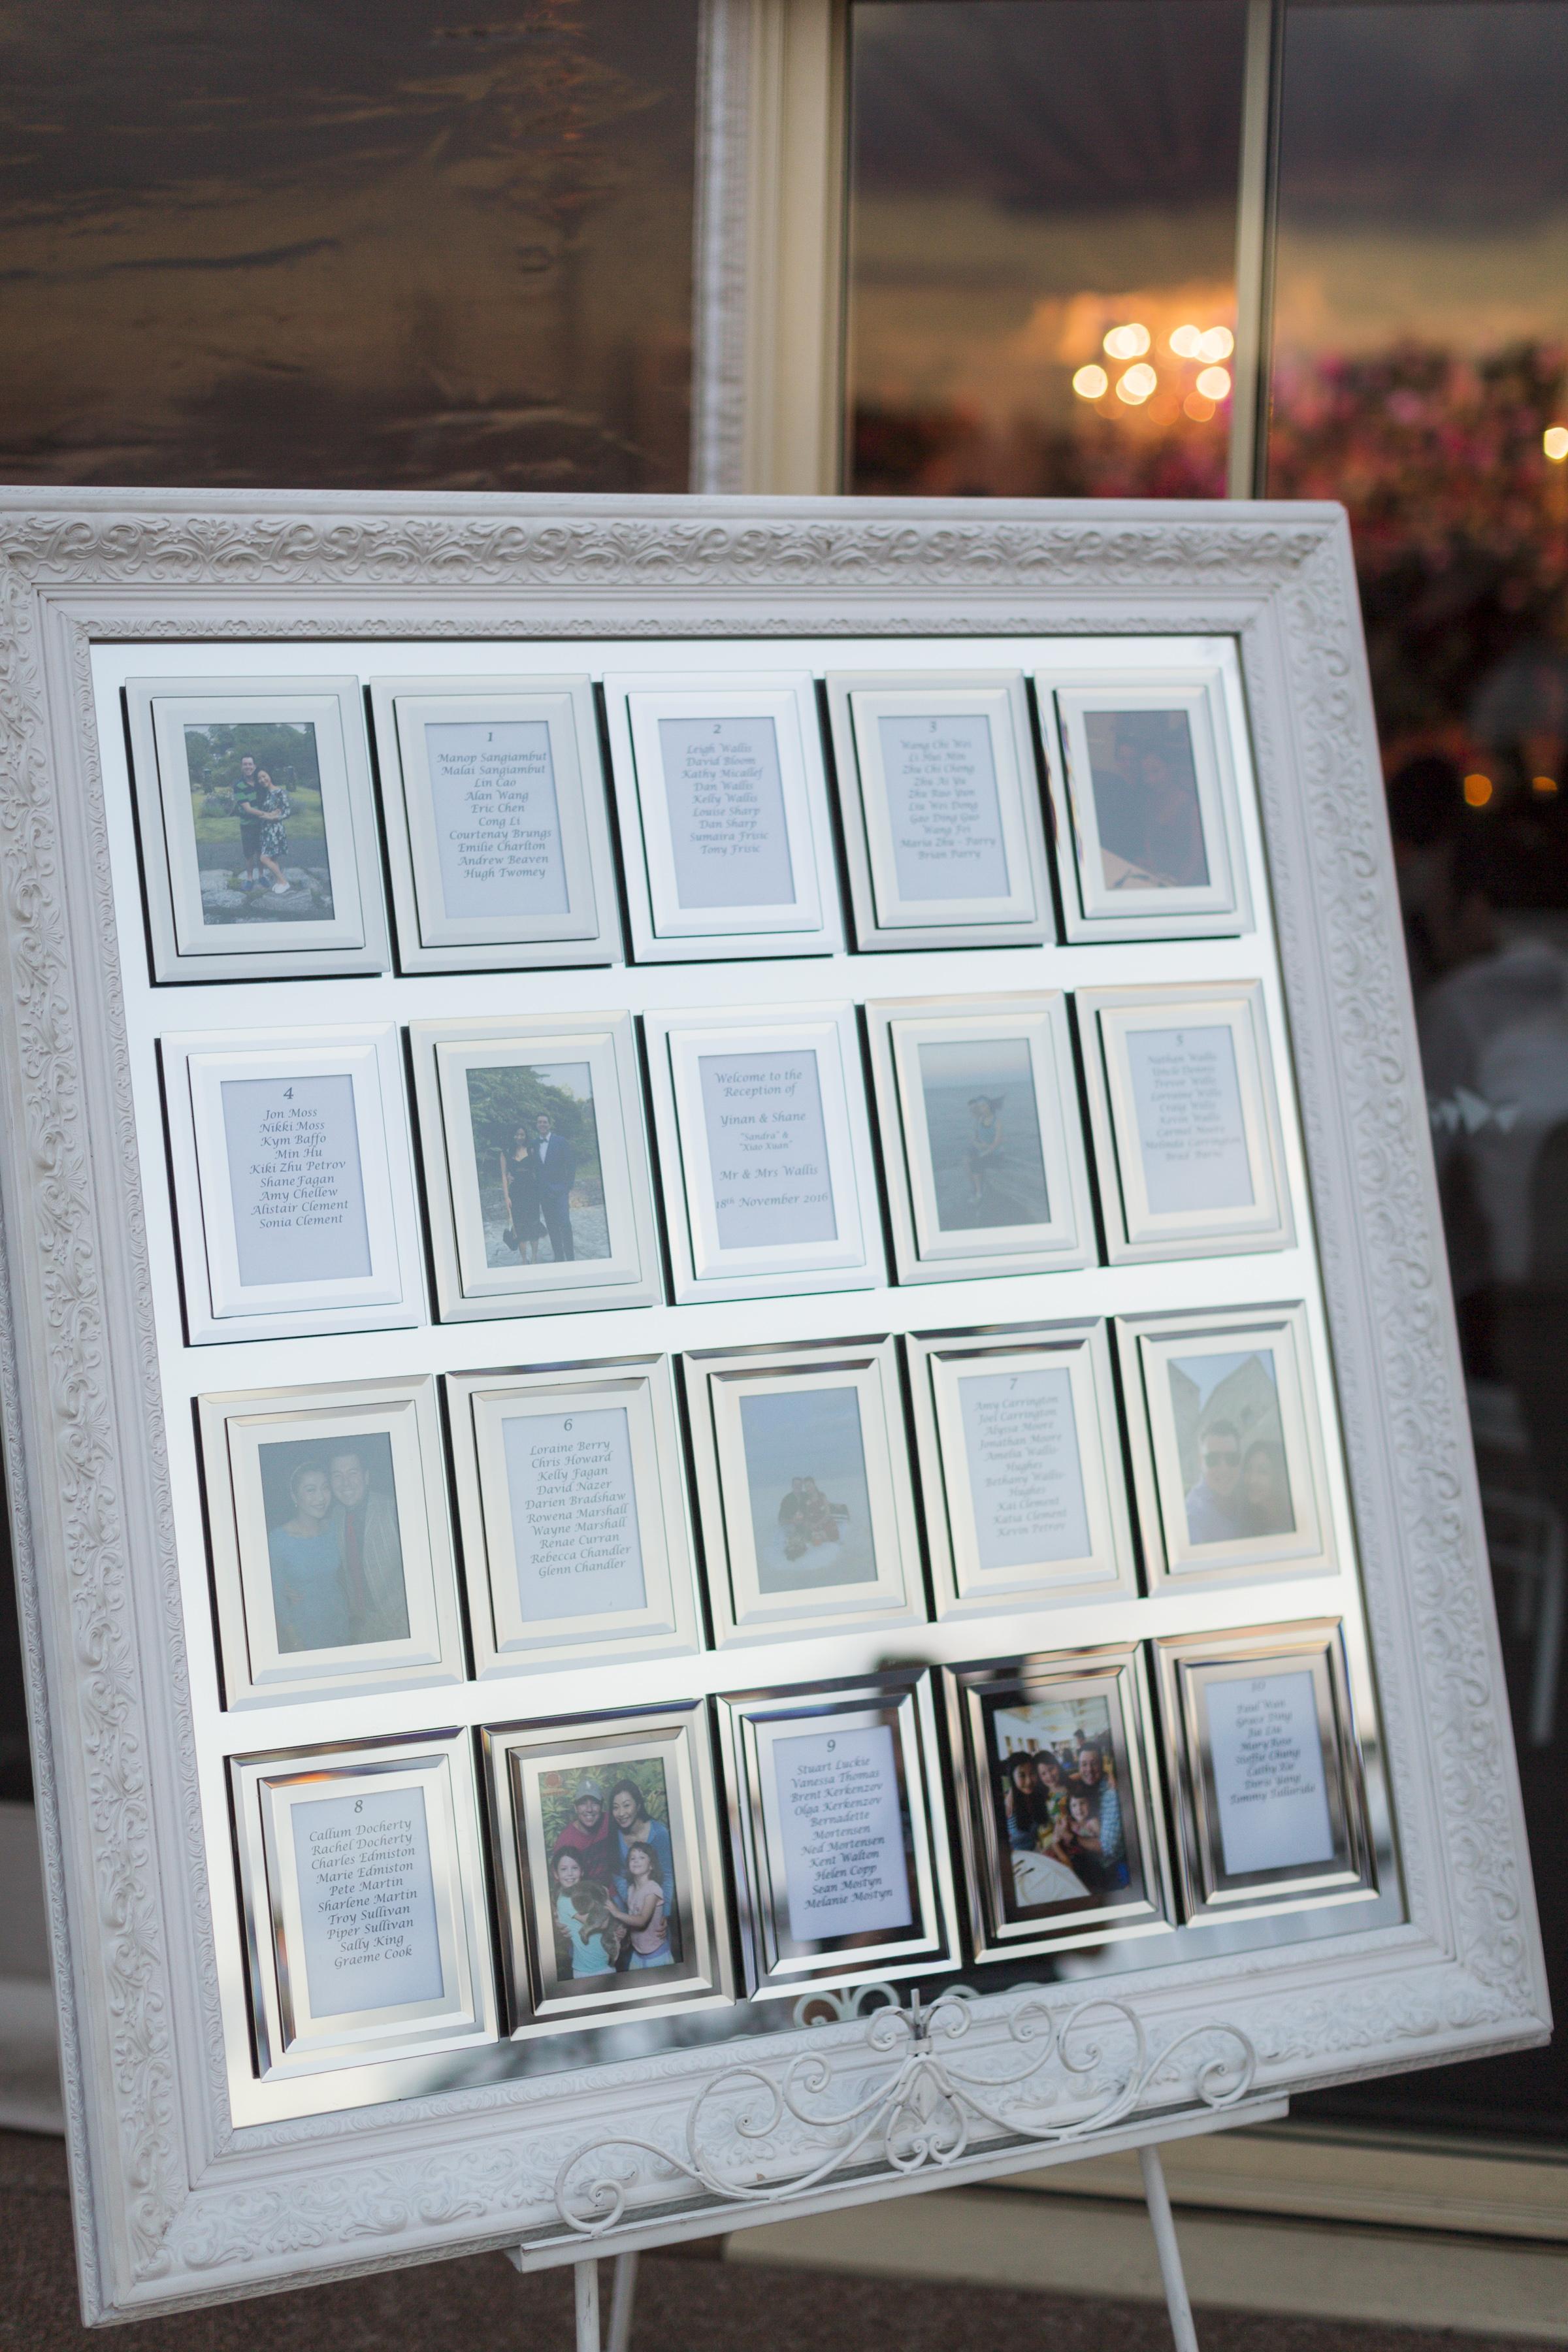 Sydney_wedding_reception_decor_20_frame_white_mirror_seating_chart_plan_easel.jpg